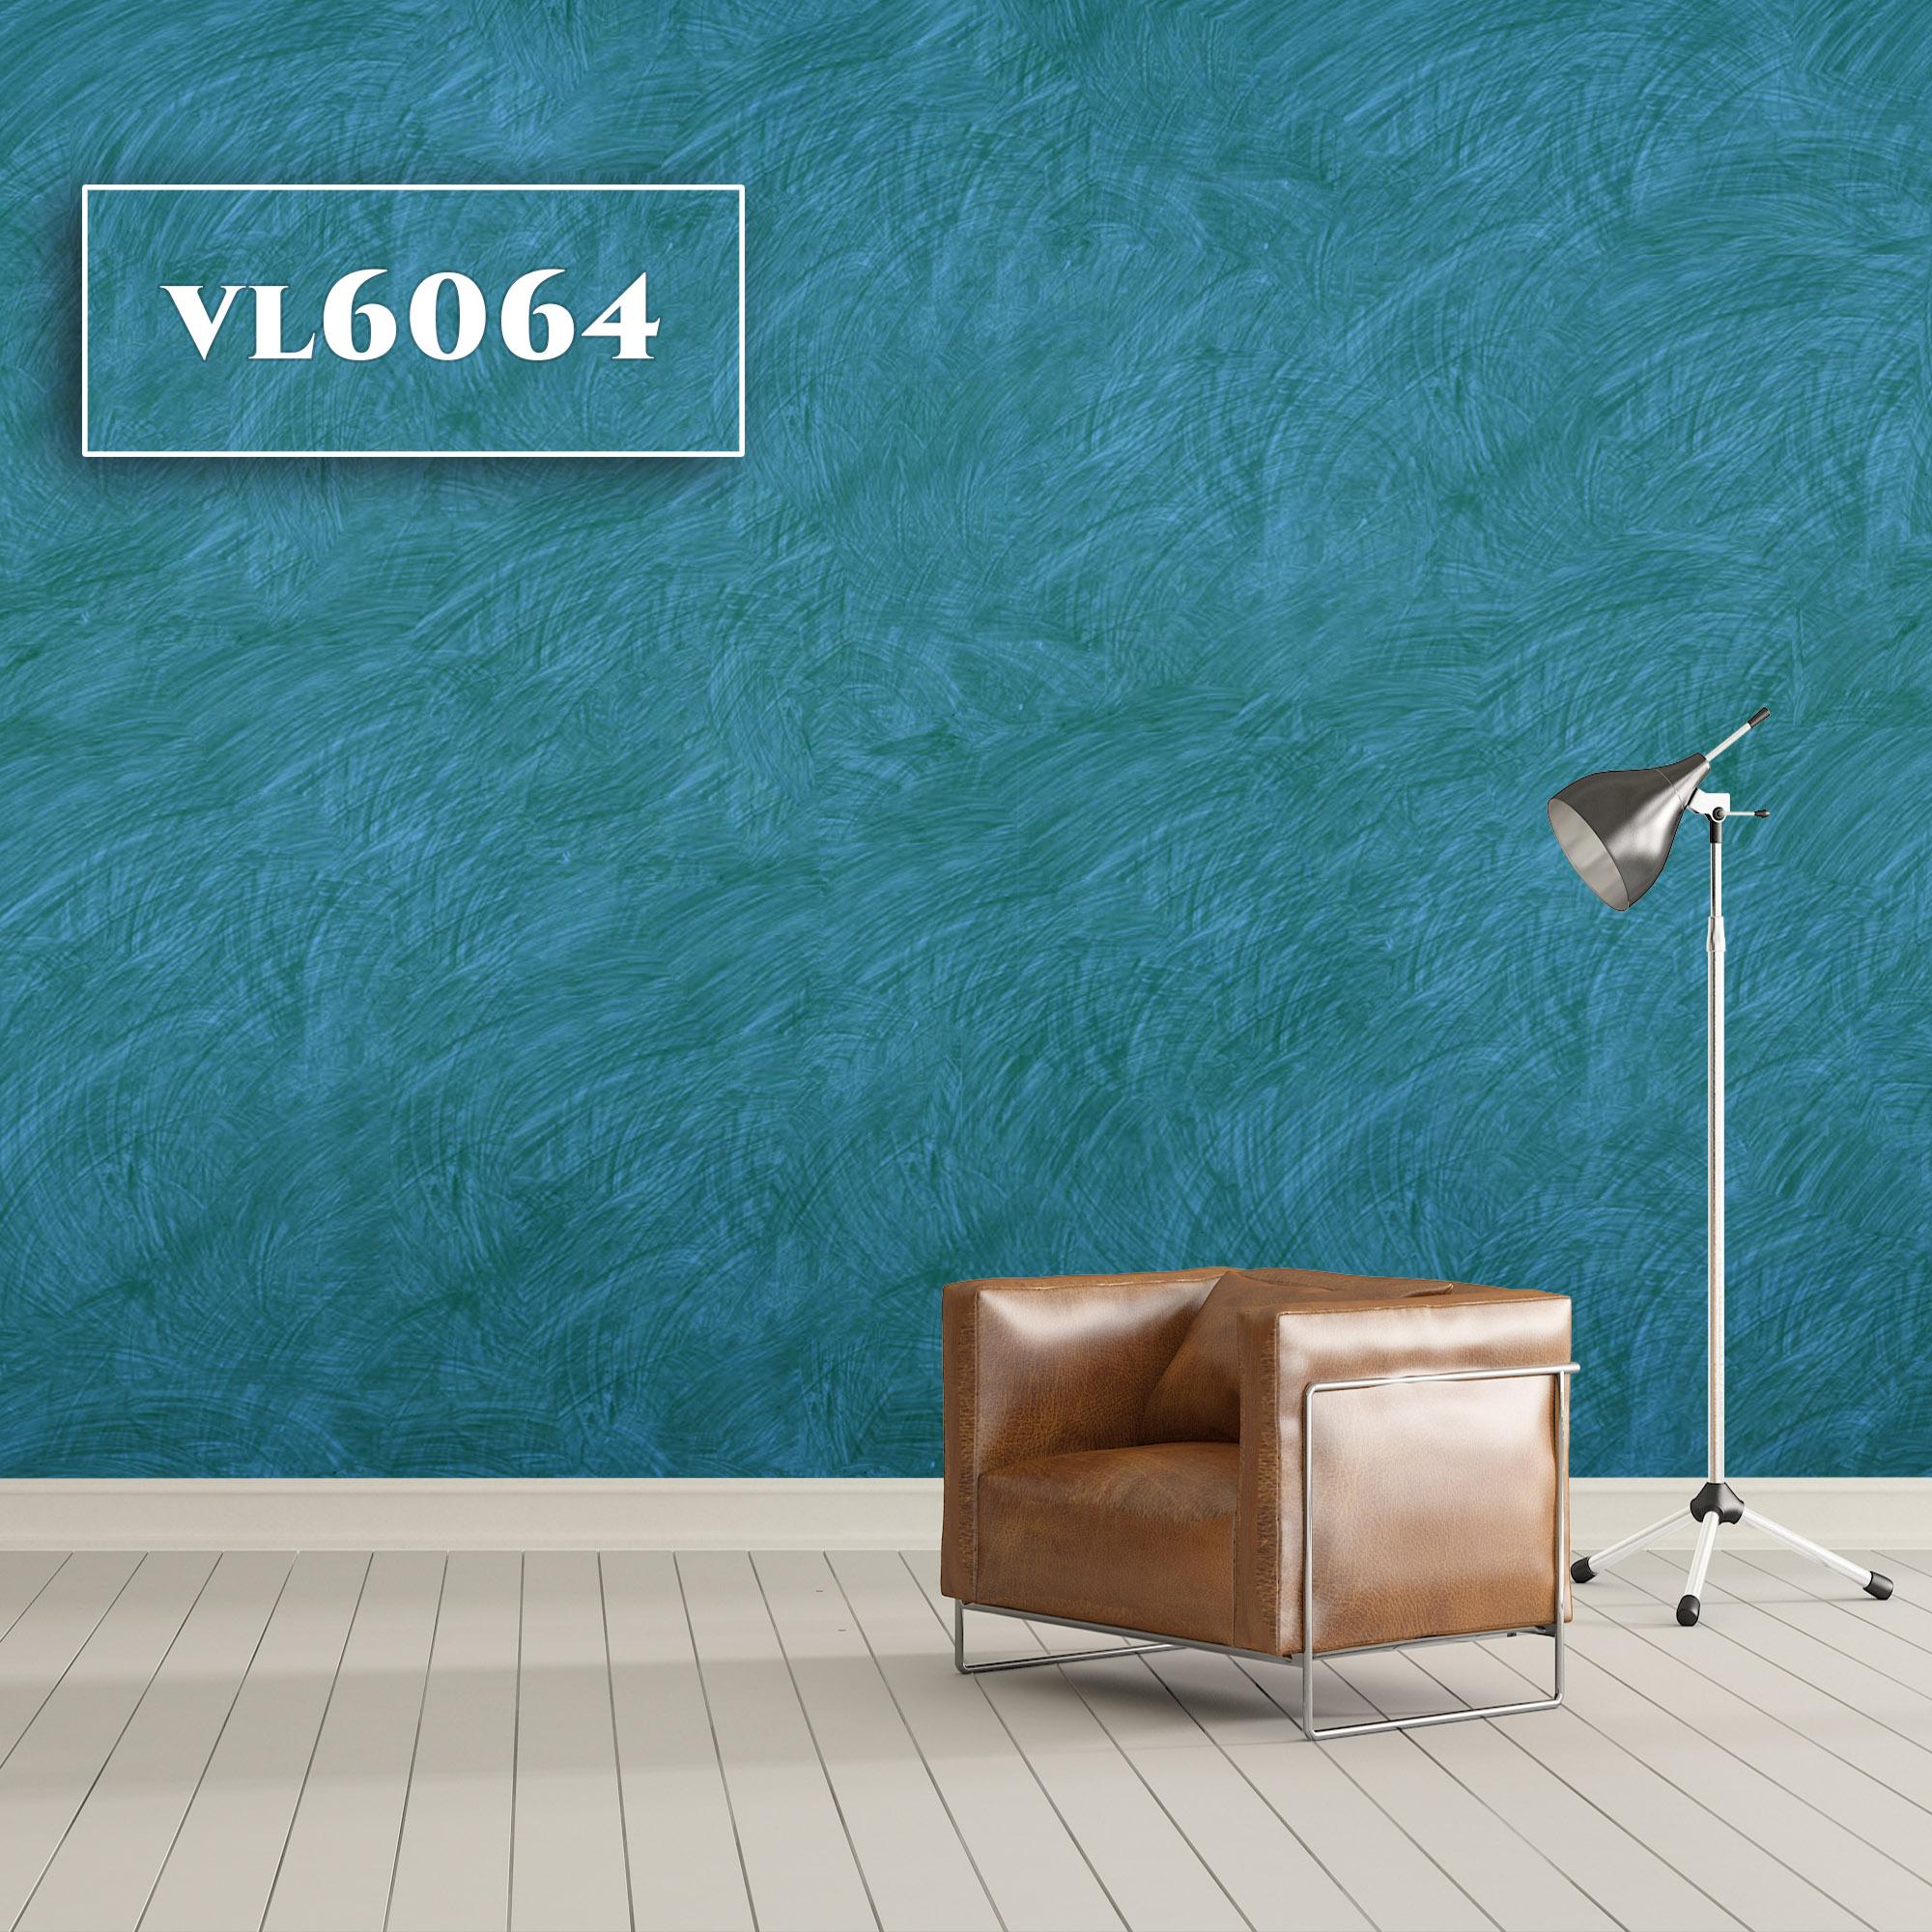 VL6064